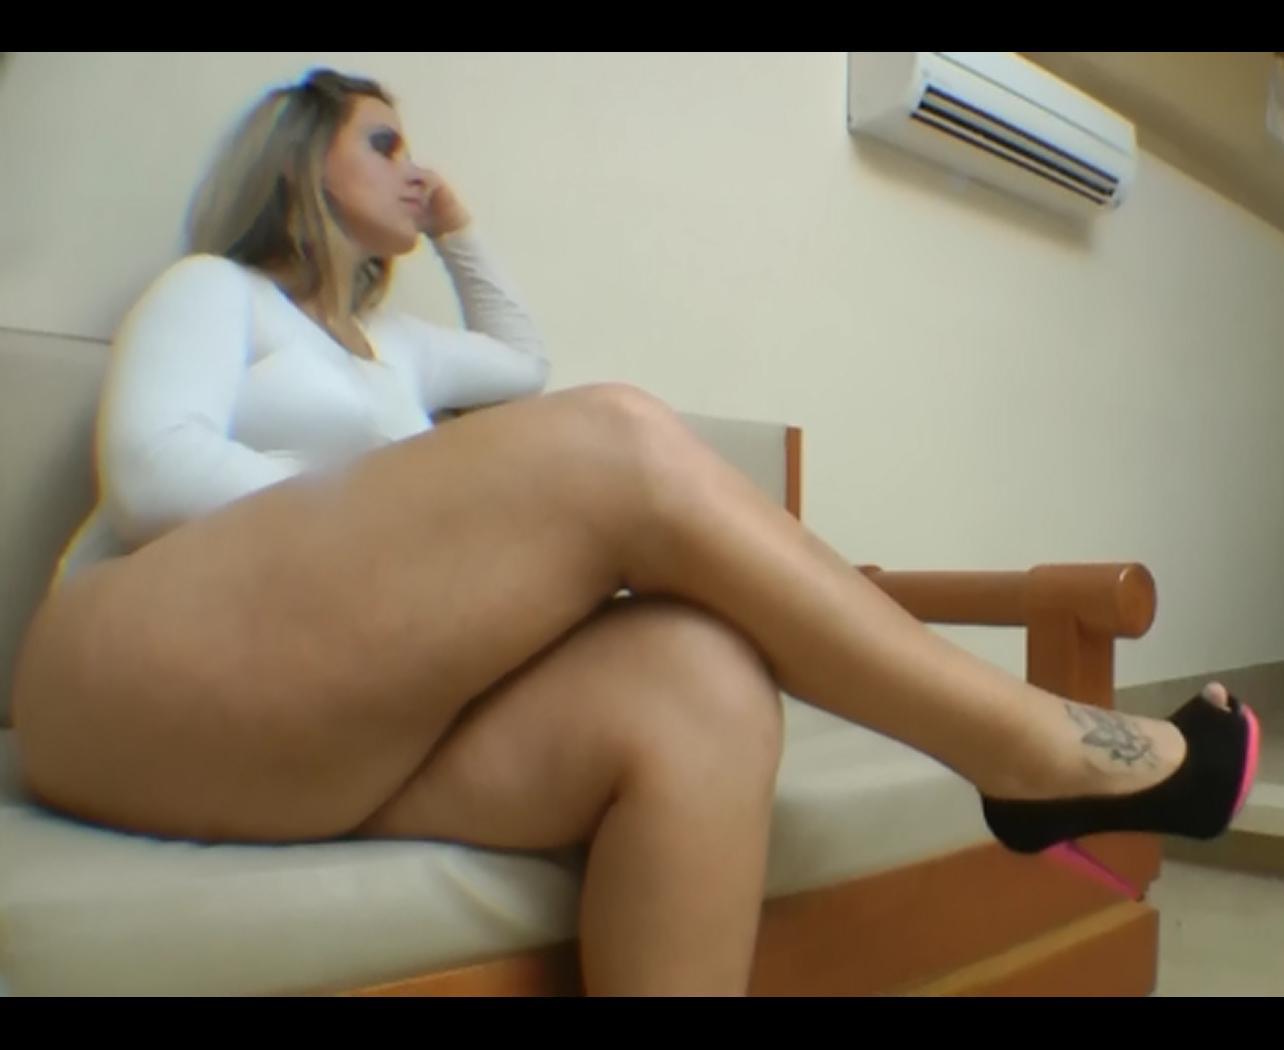 Vídeos Porno Virgo Peridot amp Vídeos de Sexo  Pornhubcom